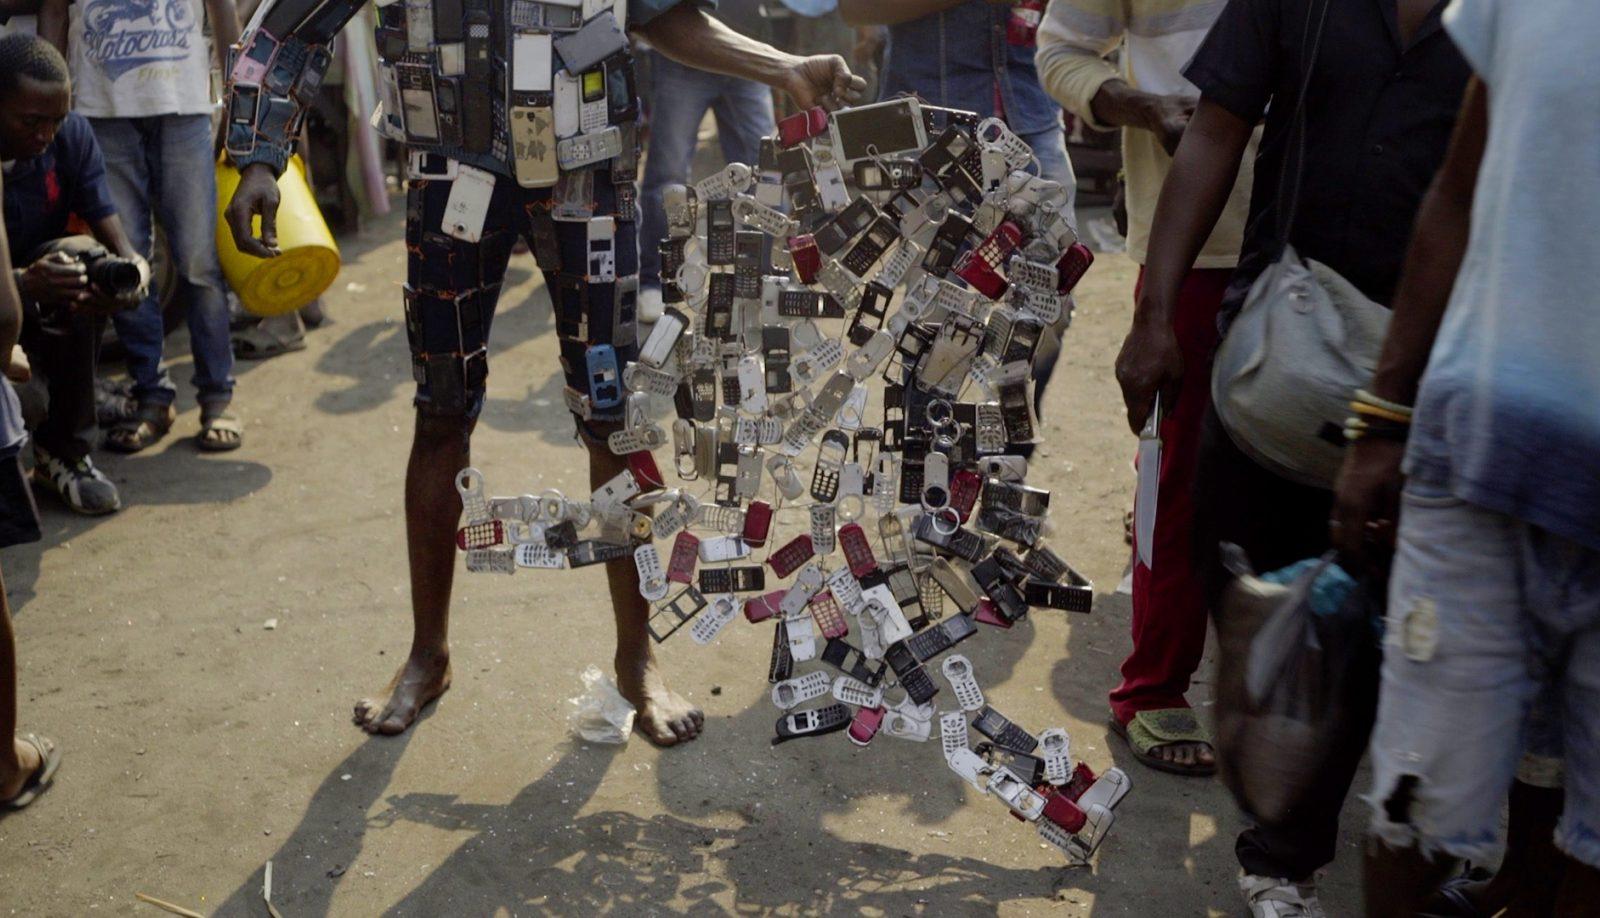 Rob Jacobs, Anne Reijniers, Nizar Saleh Mohamedali & Paul Shemisi Betutua, Faire-Part (2018).  © De Imagerie vzw and Kimpavita films.